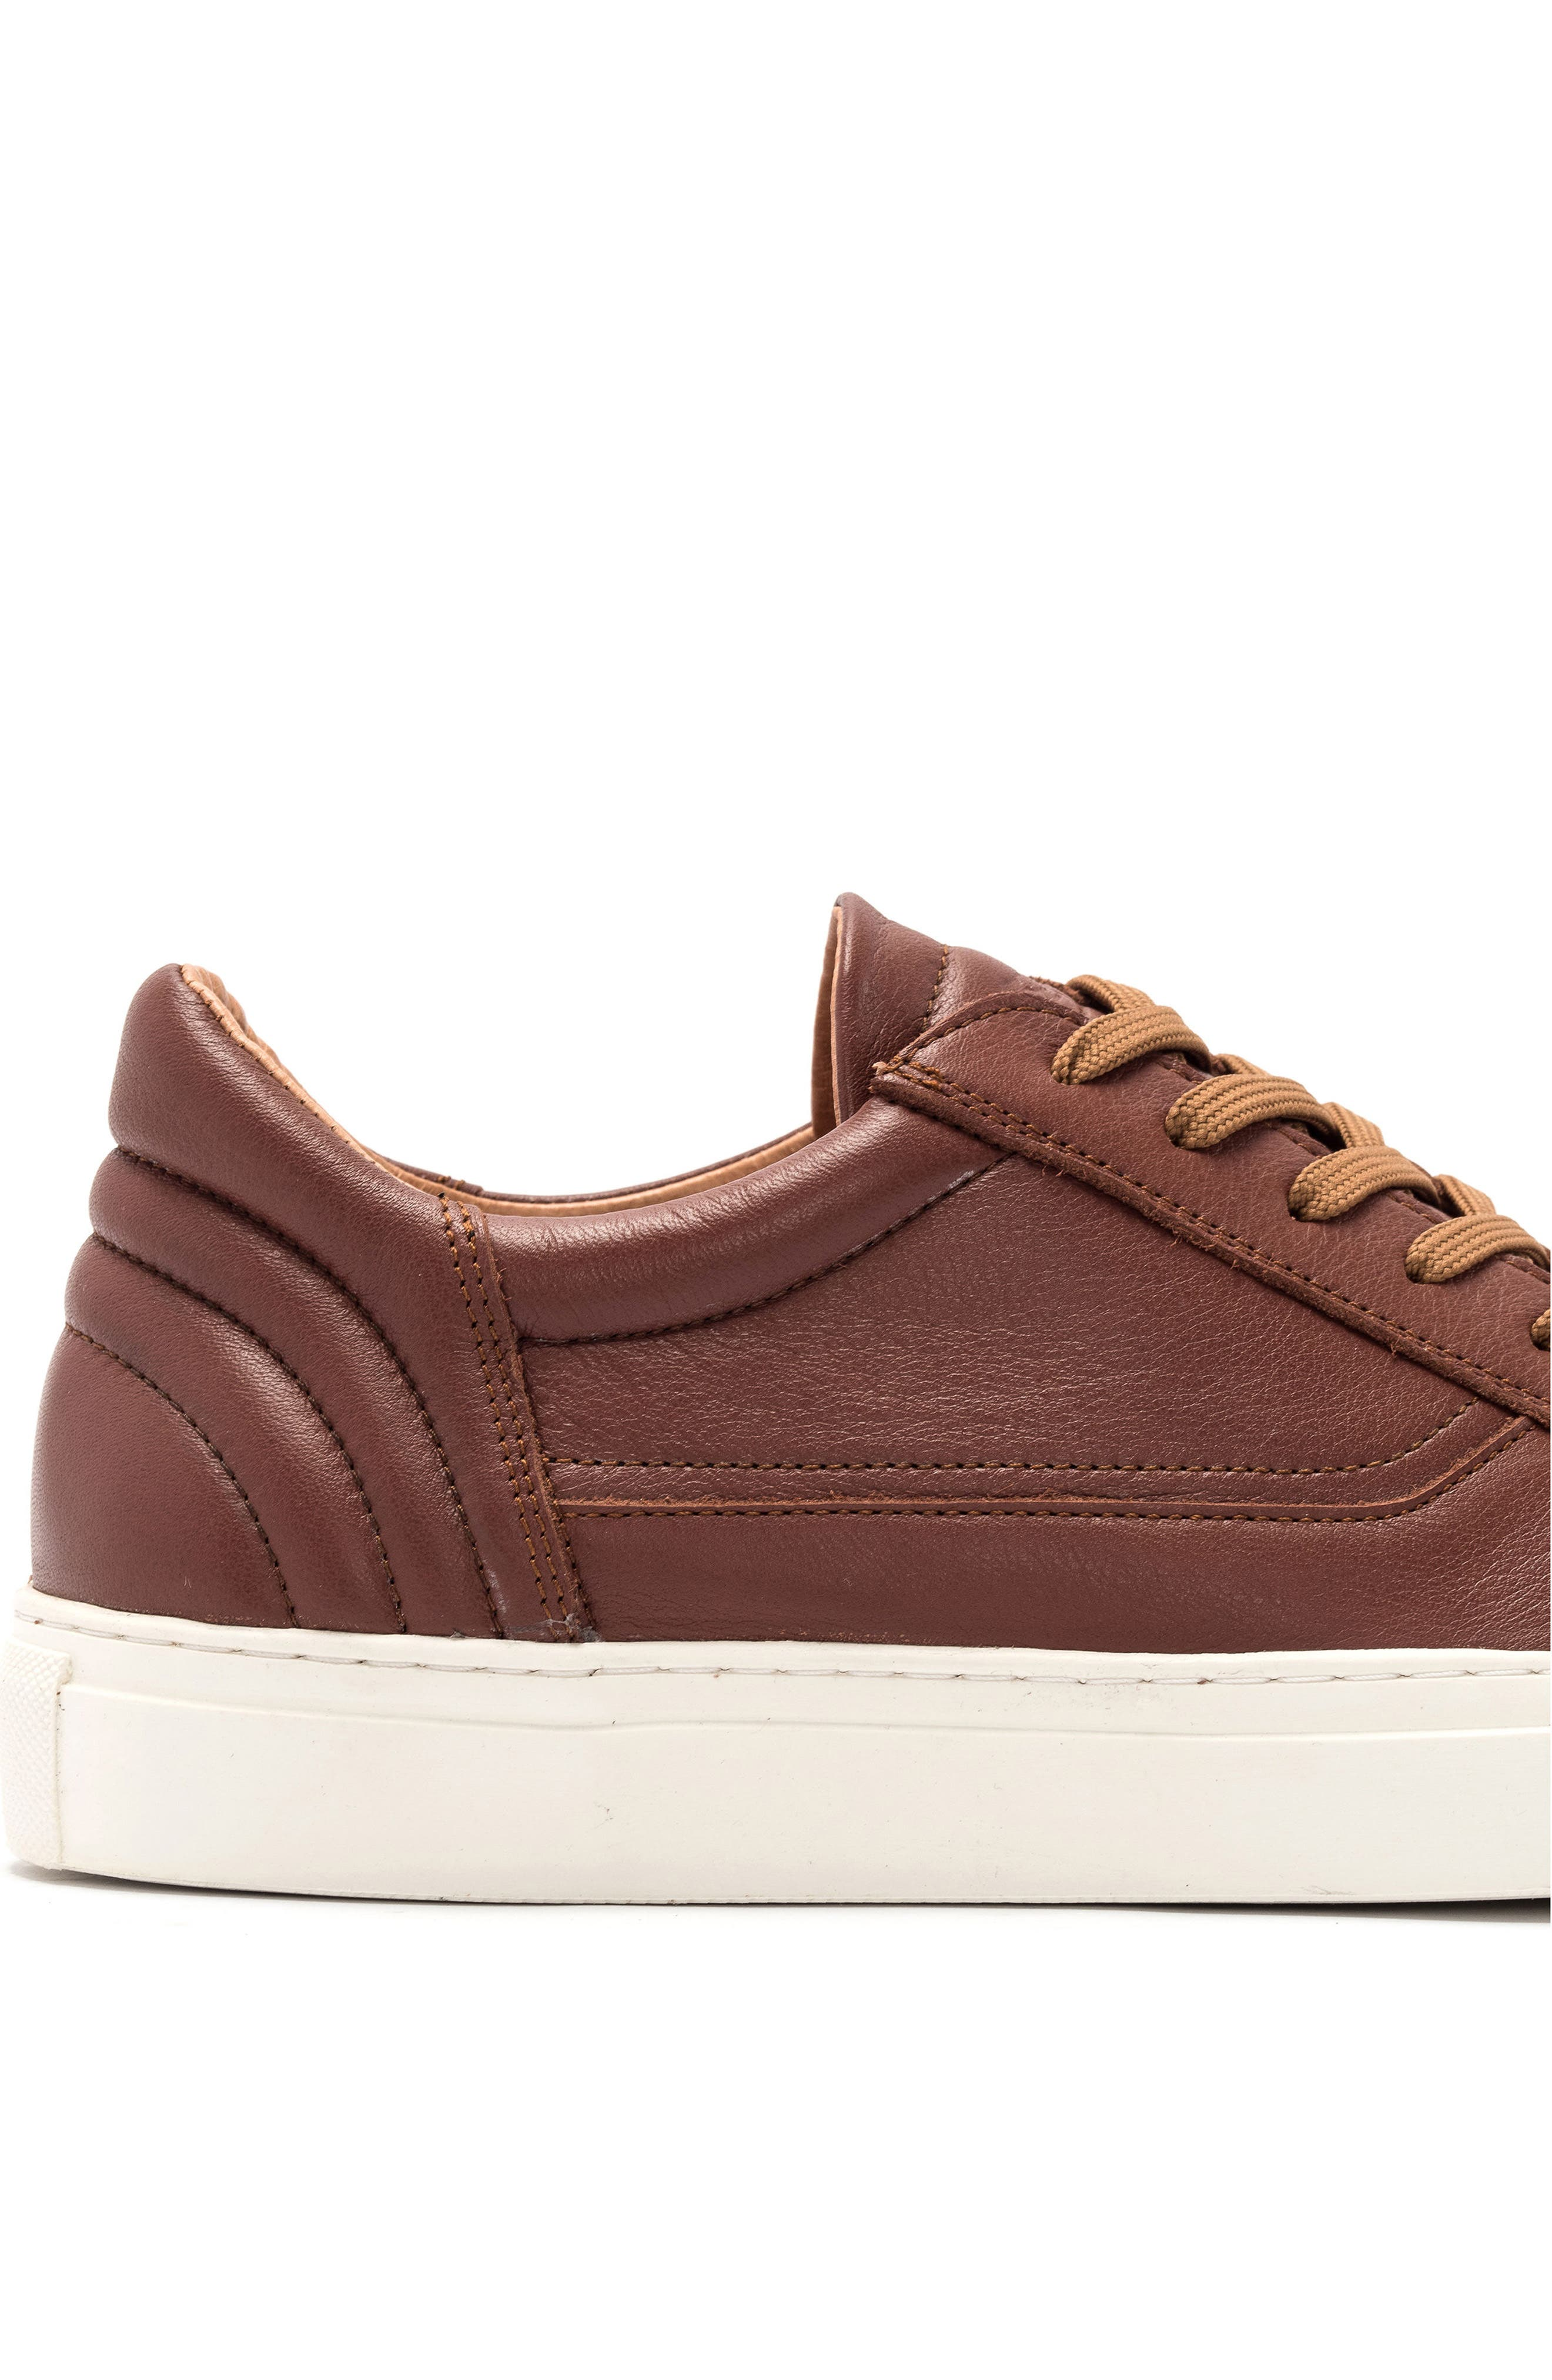 Shelton Road Sneaker,                             Alternate thumbnail 6, color,                             COFFEE